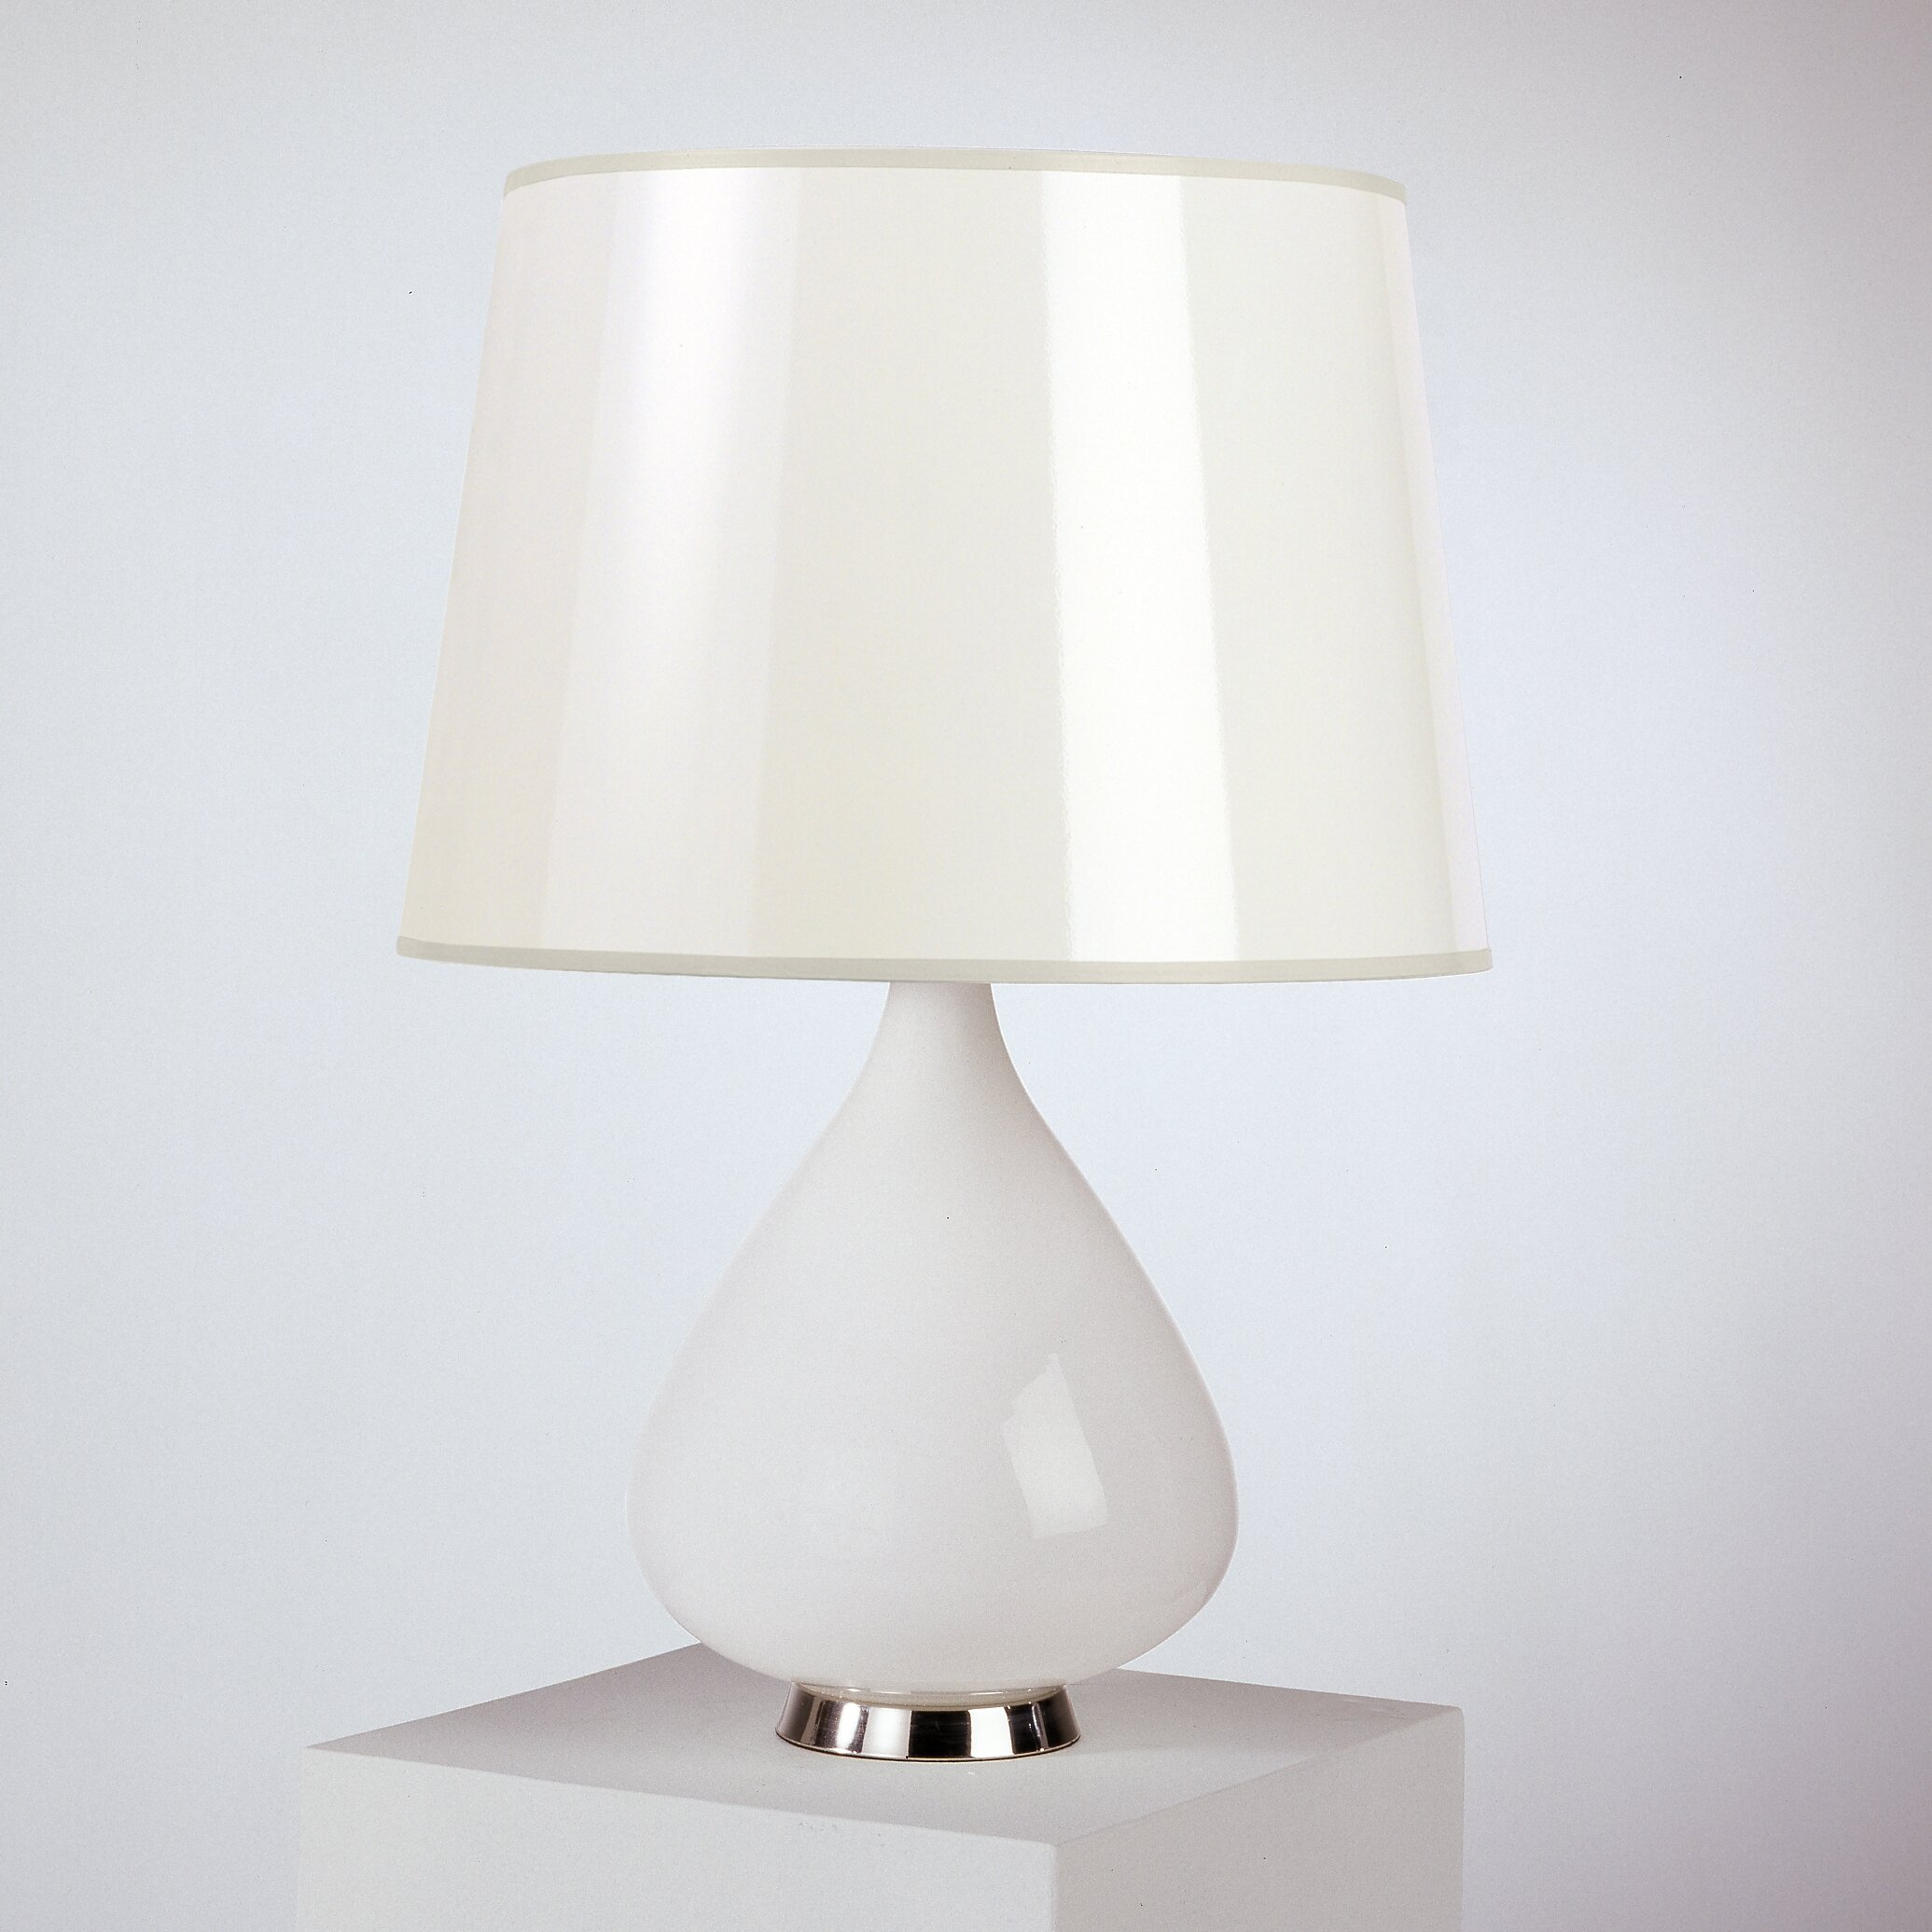 Robert Abbey Jonathan Adler Capri 25 75 Quot Table Lamp Wayfair